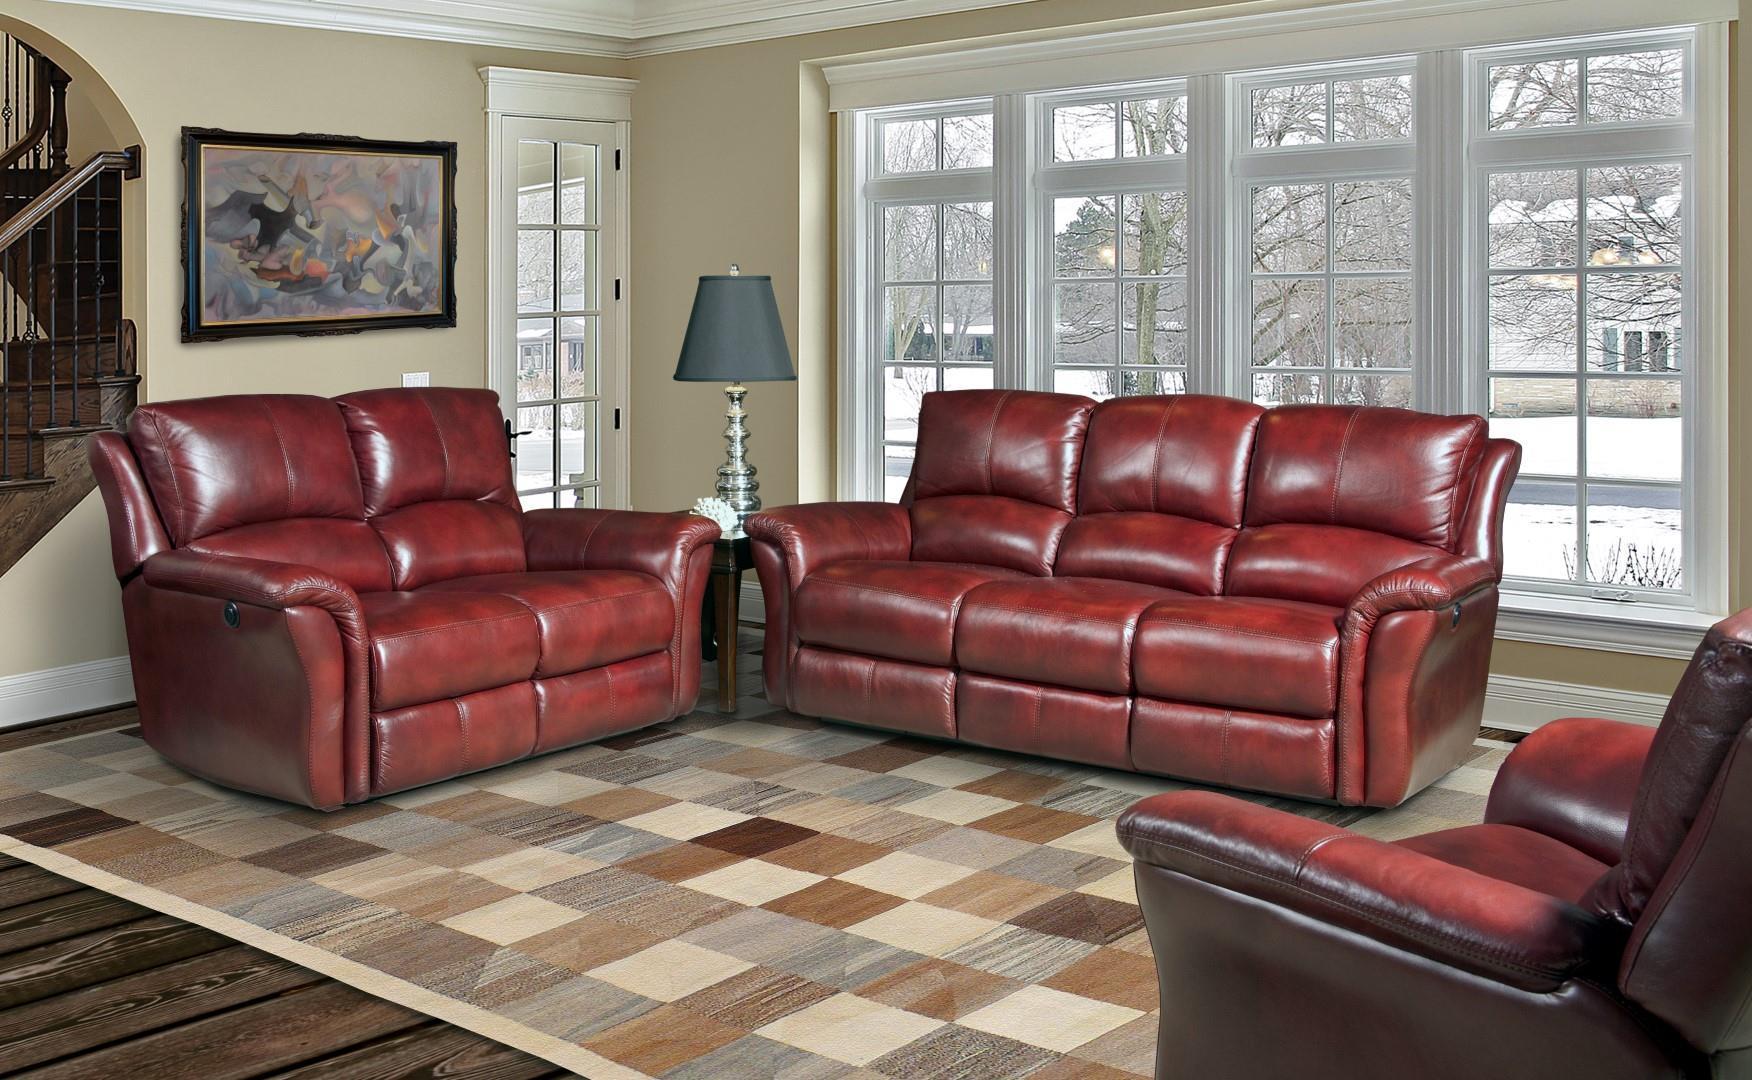 Parker Living Lewis Reclining Living Room Group - Item Number: MLEW-LI-Living Room Group